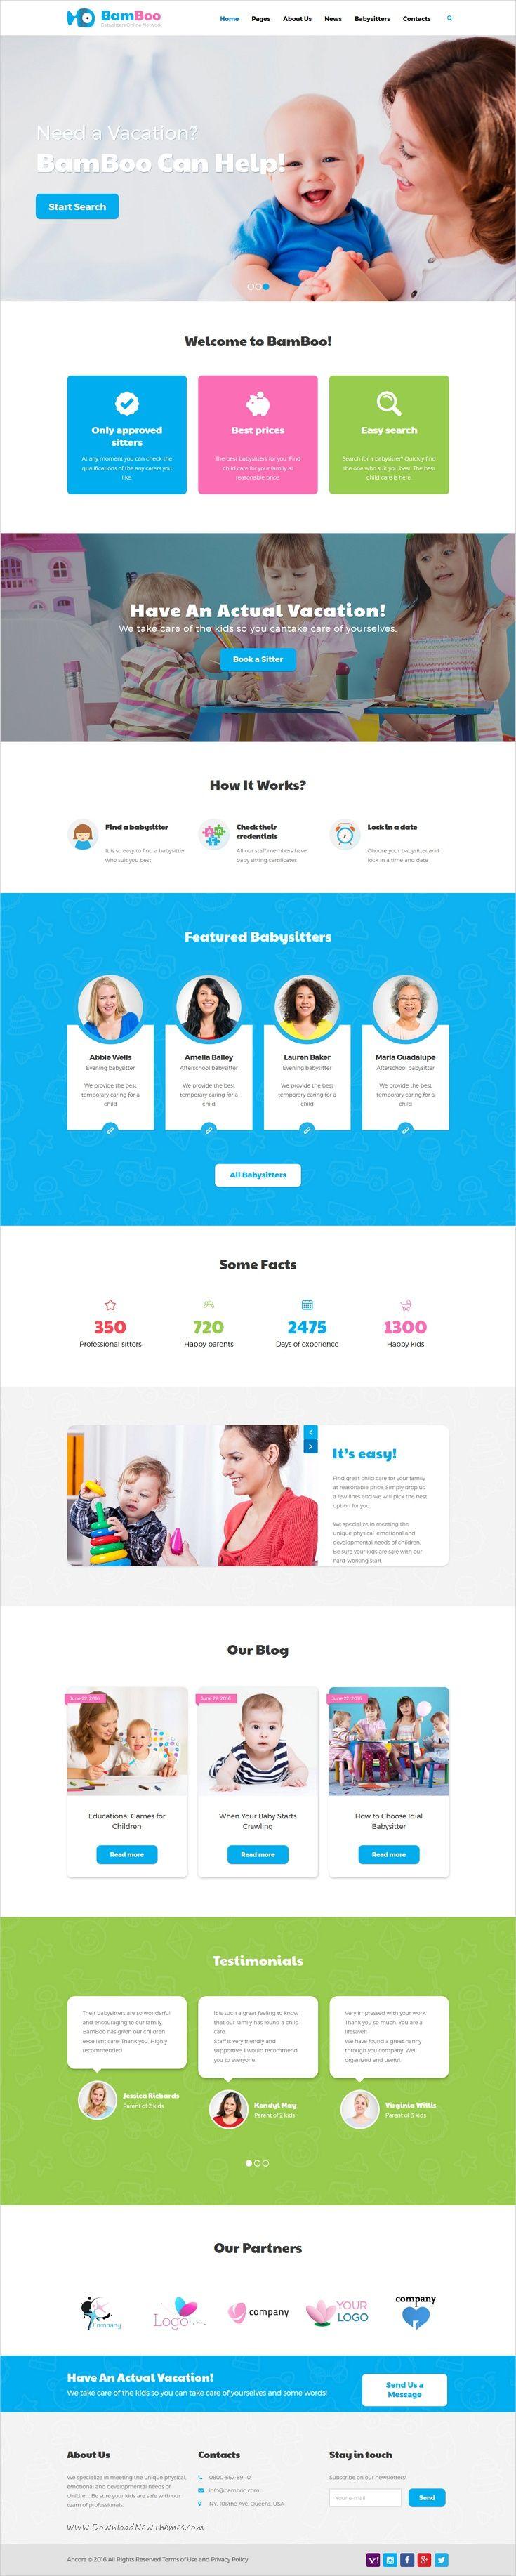 Bamboo is a modern and functional design responsive #WordPress theme for #babysitters online network, professional #nurses teams, nannies, preschool, kindergarten or children educational websites download now➩ https://themeforest.net/item/bamboo-babysitters-online-network-wp-theme/17324294?ref=Datasata